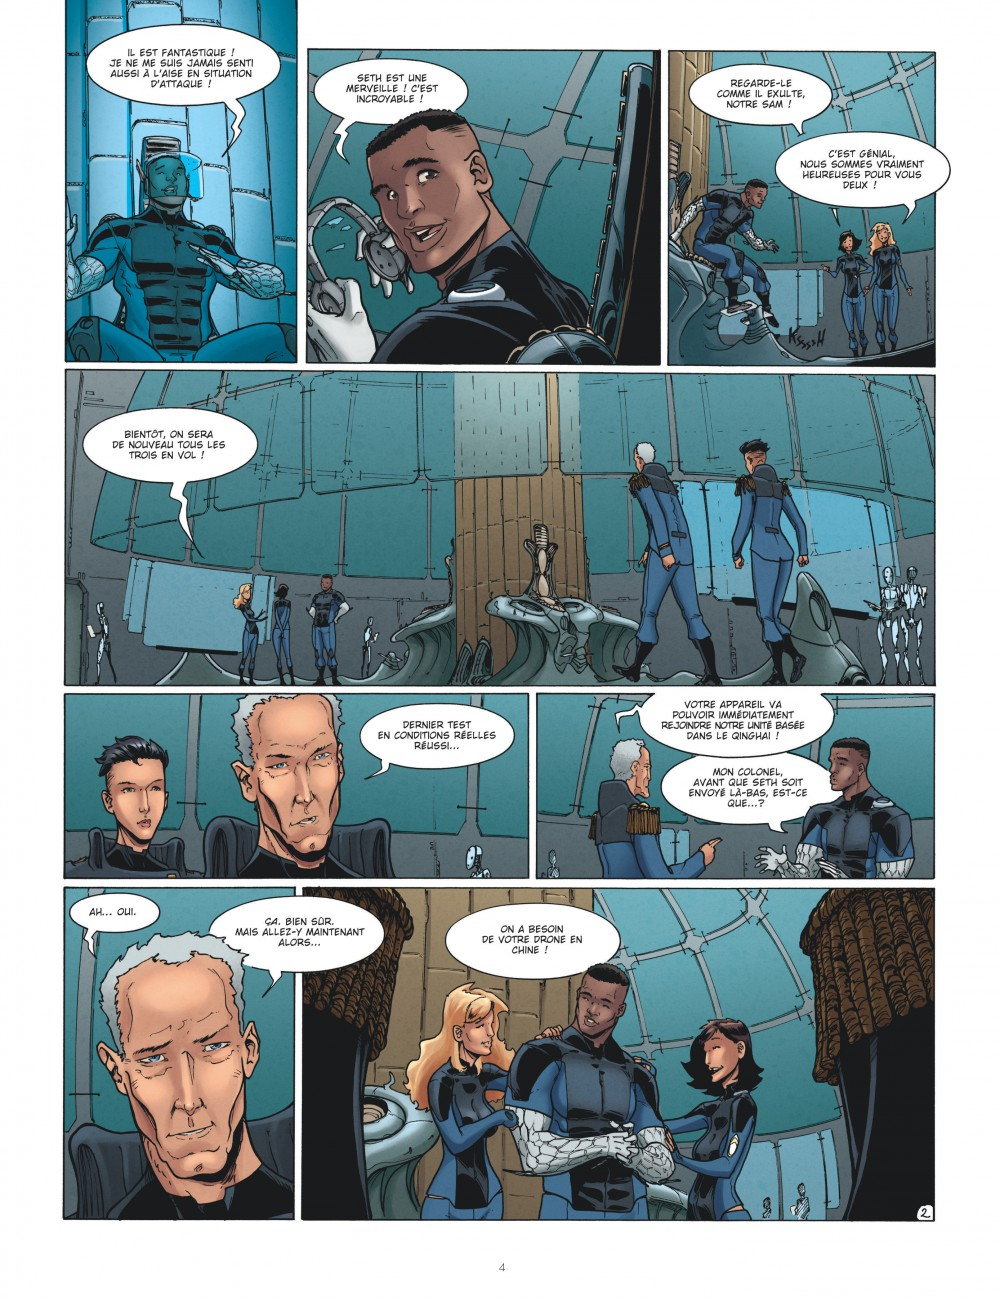 Drones #2, Post-Trauma, Sylvain Runberg, Louis, Le Lombard